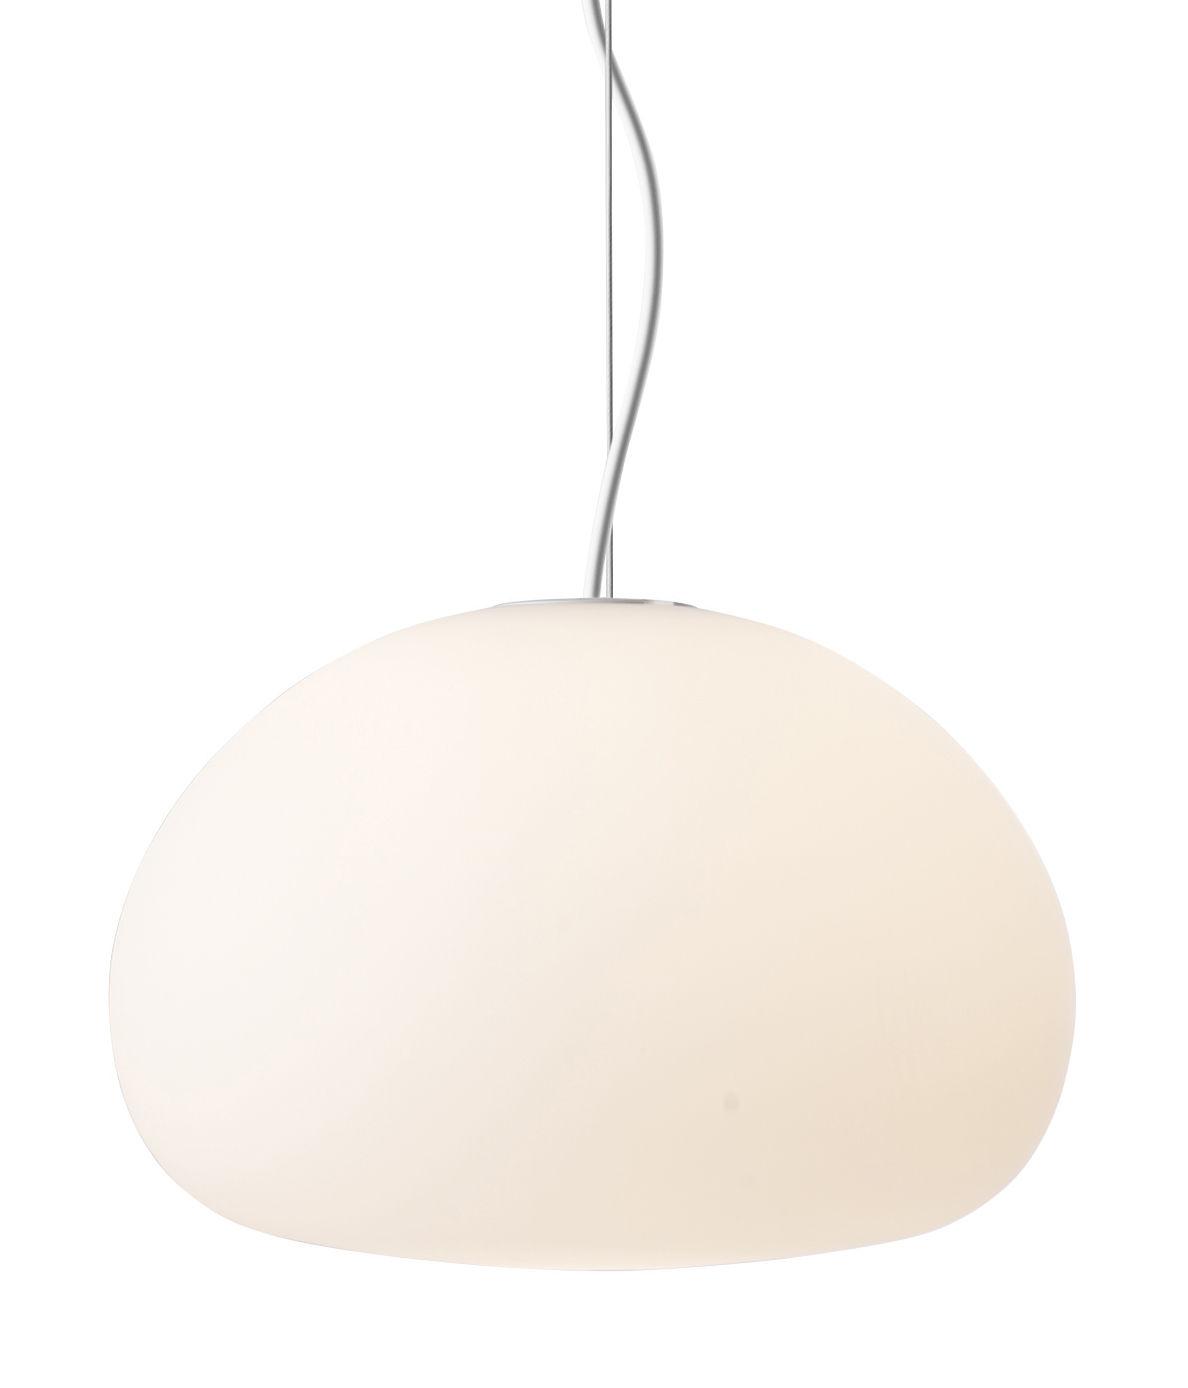 Lighting - Pendant Lighting - Fluid Small Pendant by Muuto - White - Opal Glass